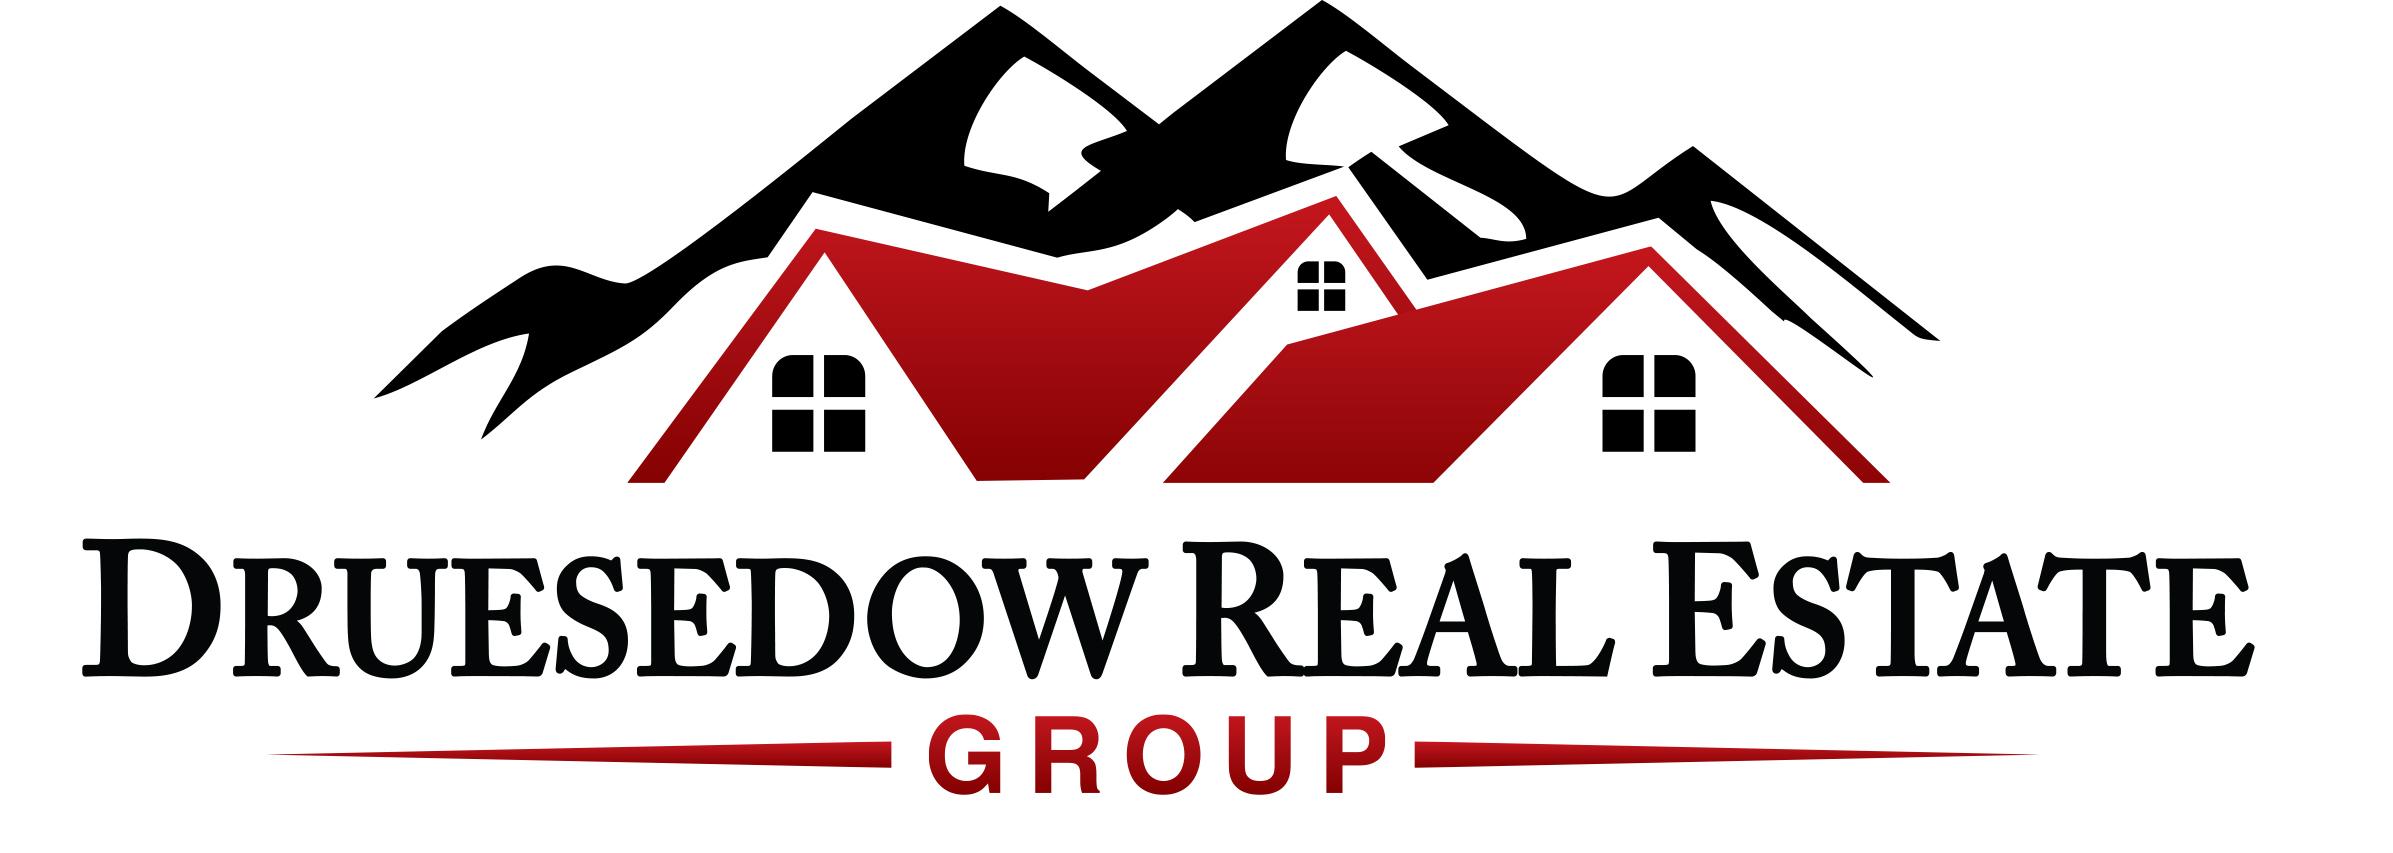 Druesedow Real Estate Group, Keller Williams Realty, Group One, Inc. logo